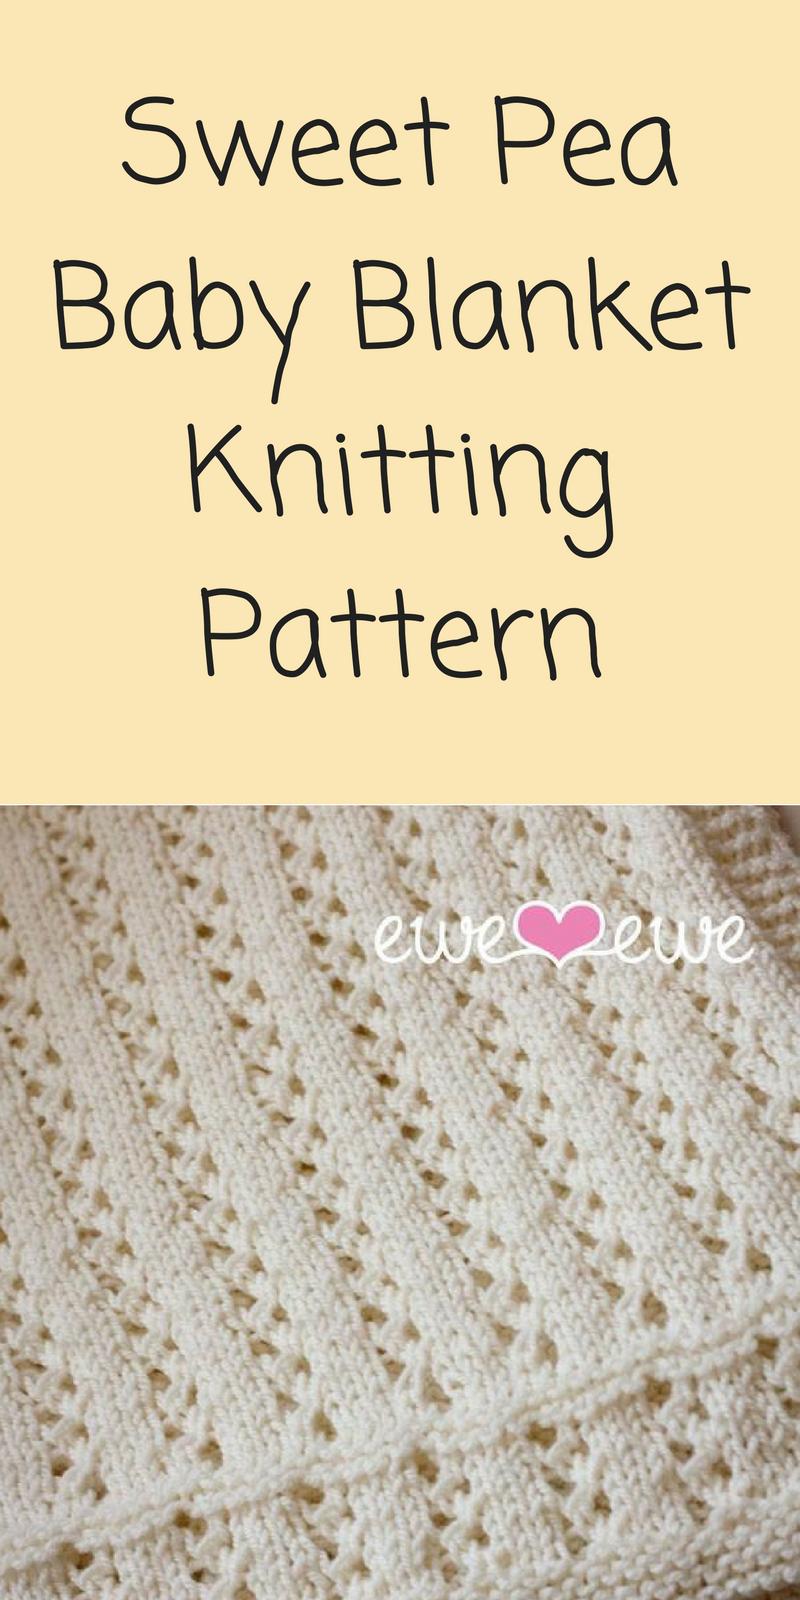 SWEETPEA baby knitting pattern